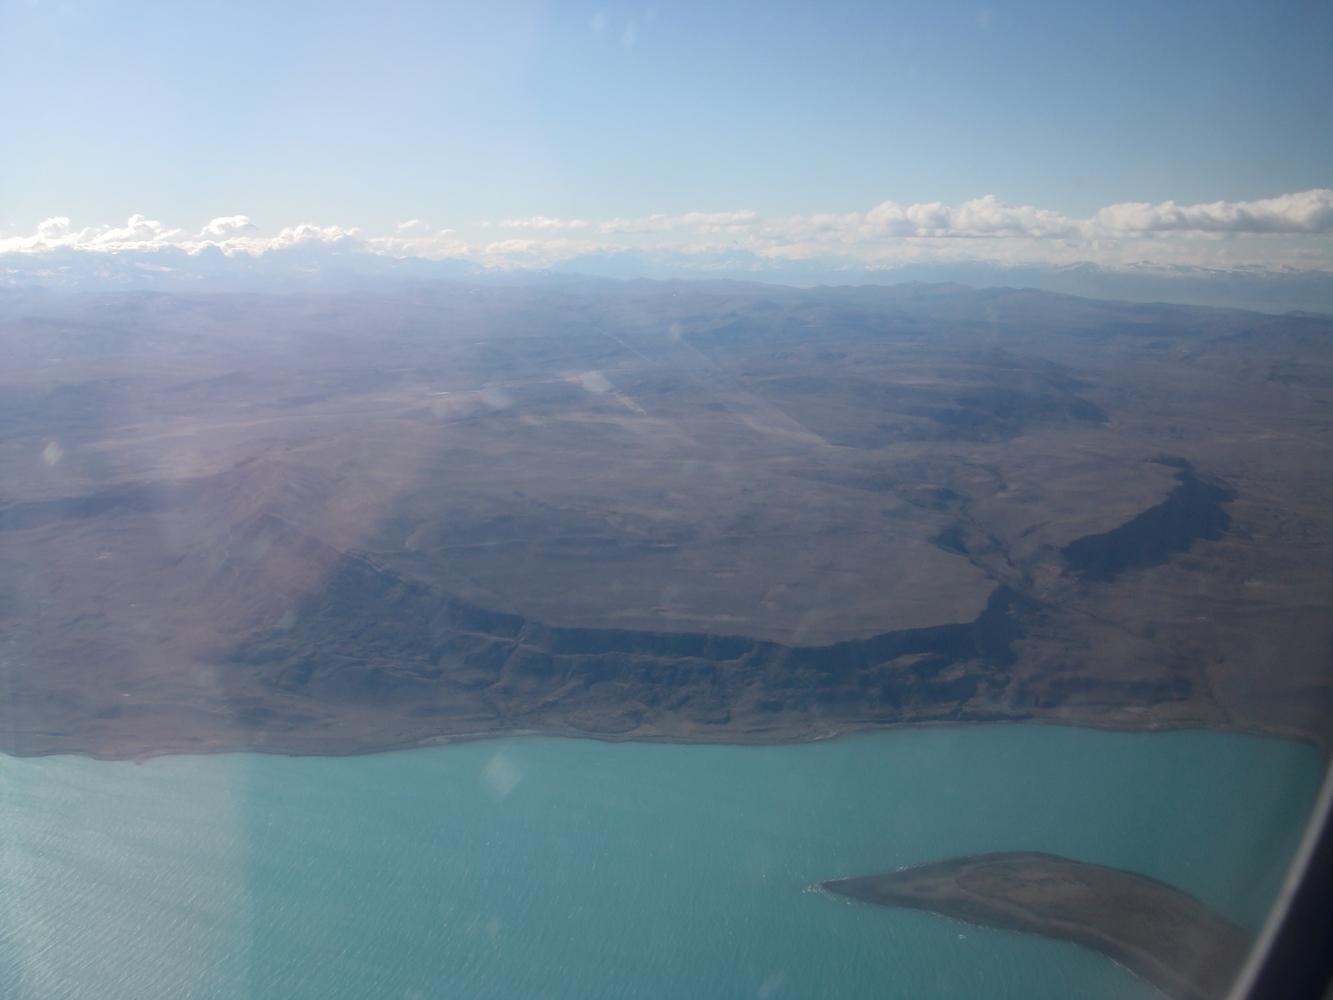 Lago Argentino - El Calafate - Vue depuis l'avion